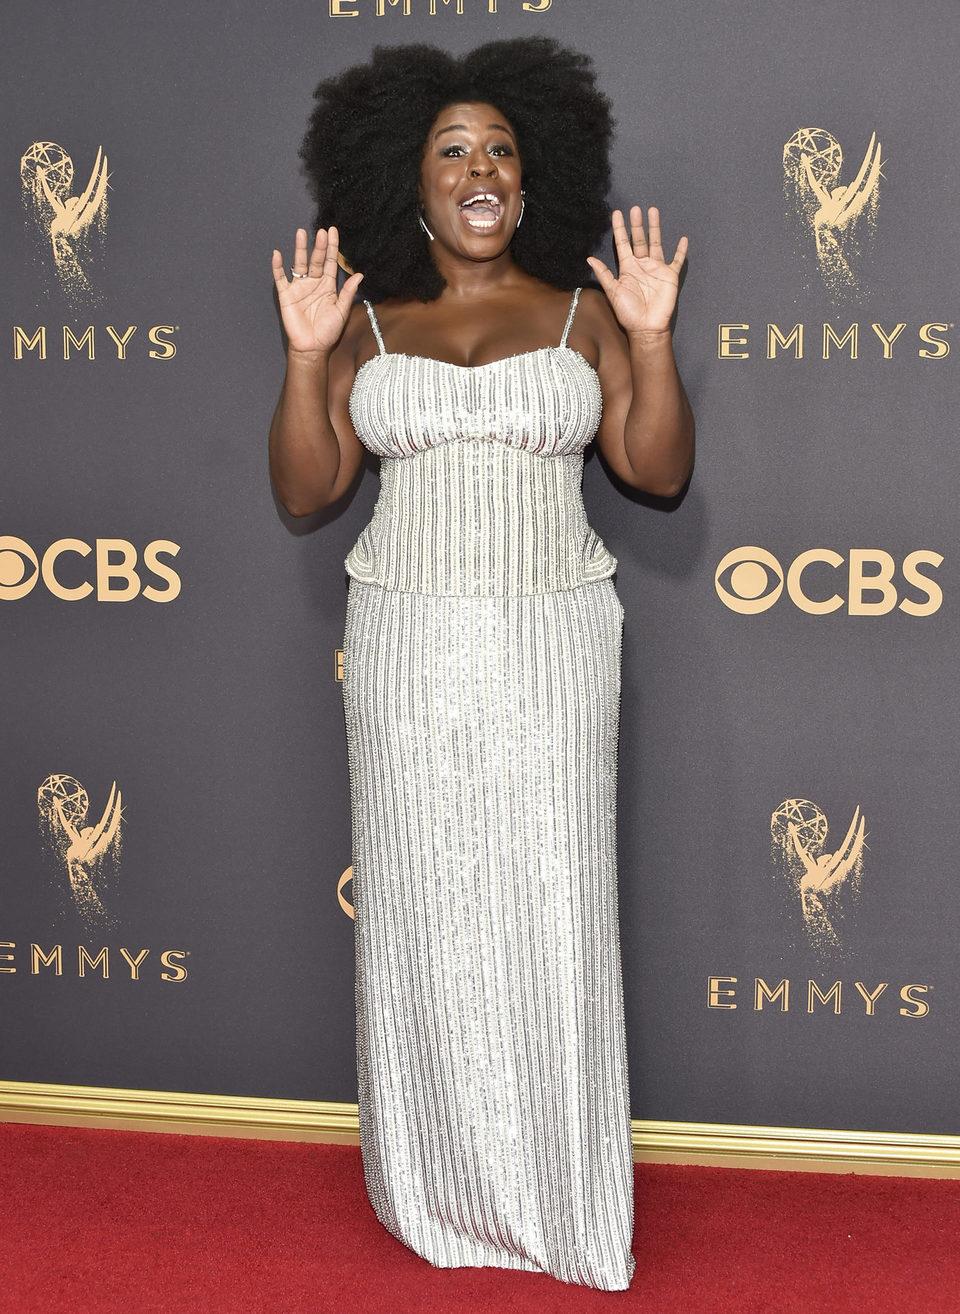 Uzo Aduba at the Emmys 2017 red carpet